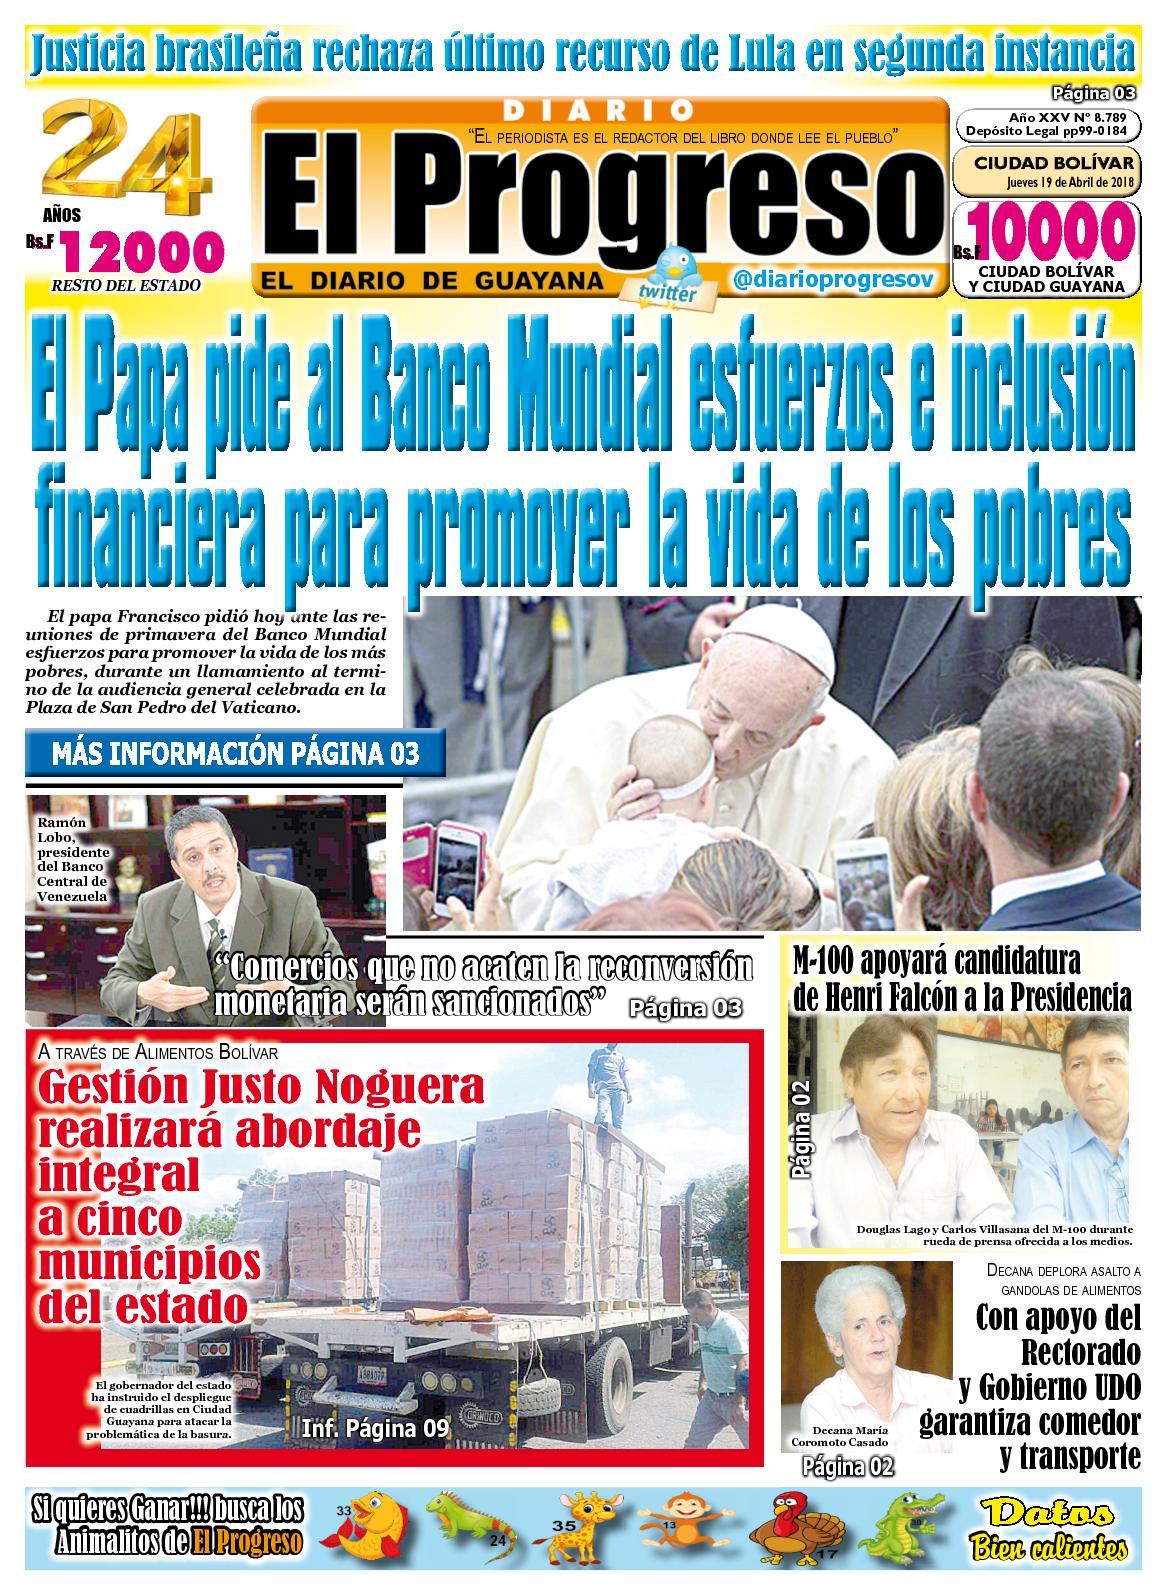 Calaméo - Diarioelprogreso2018 04 19 7adb9a9116934